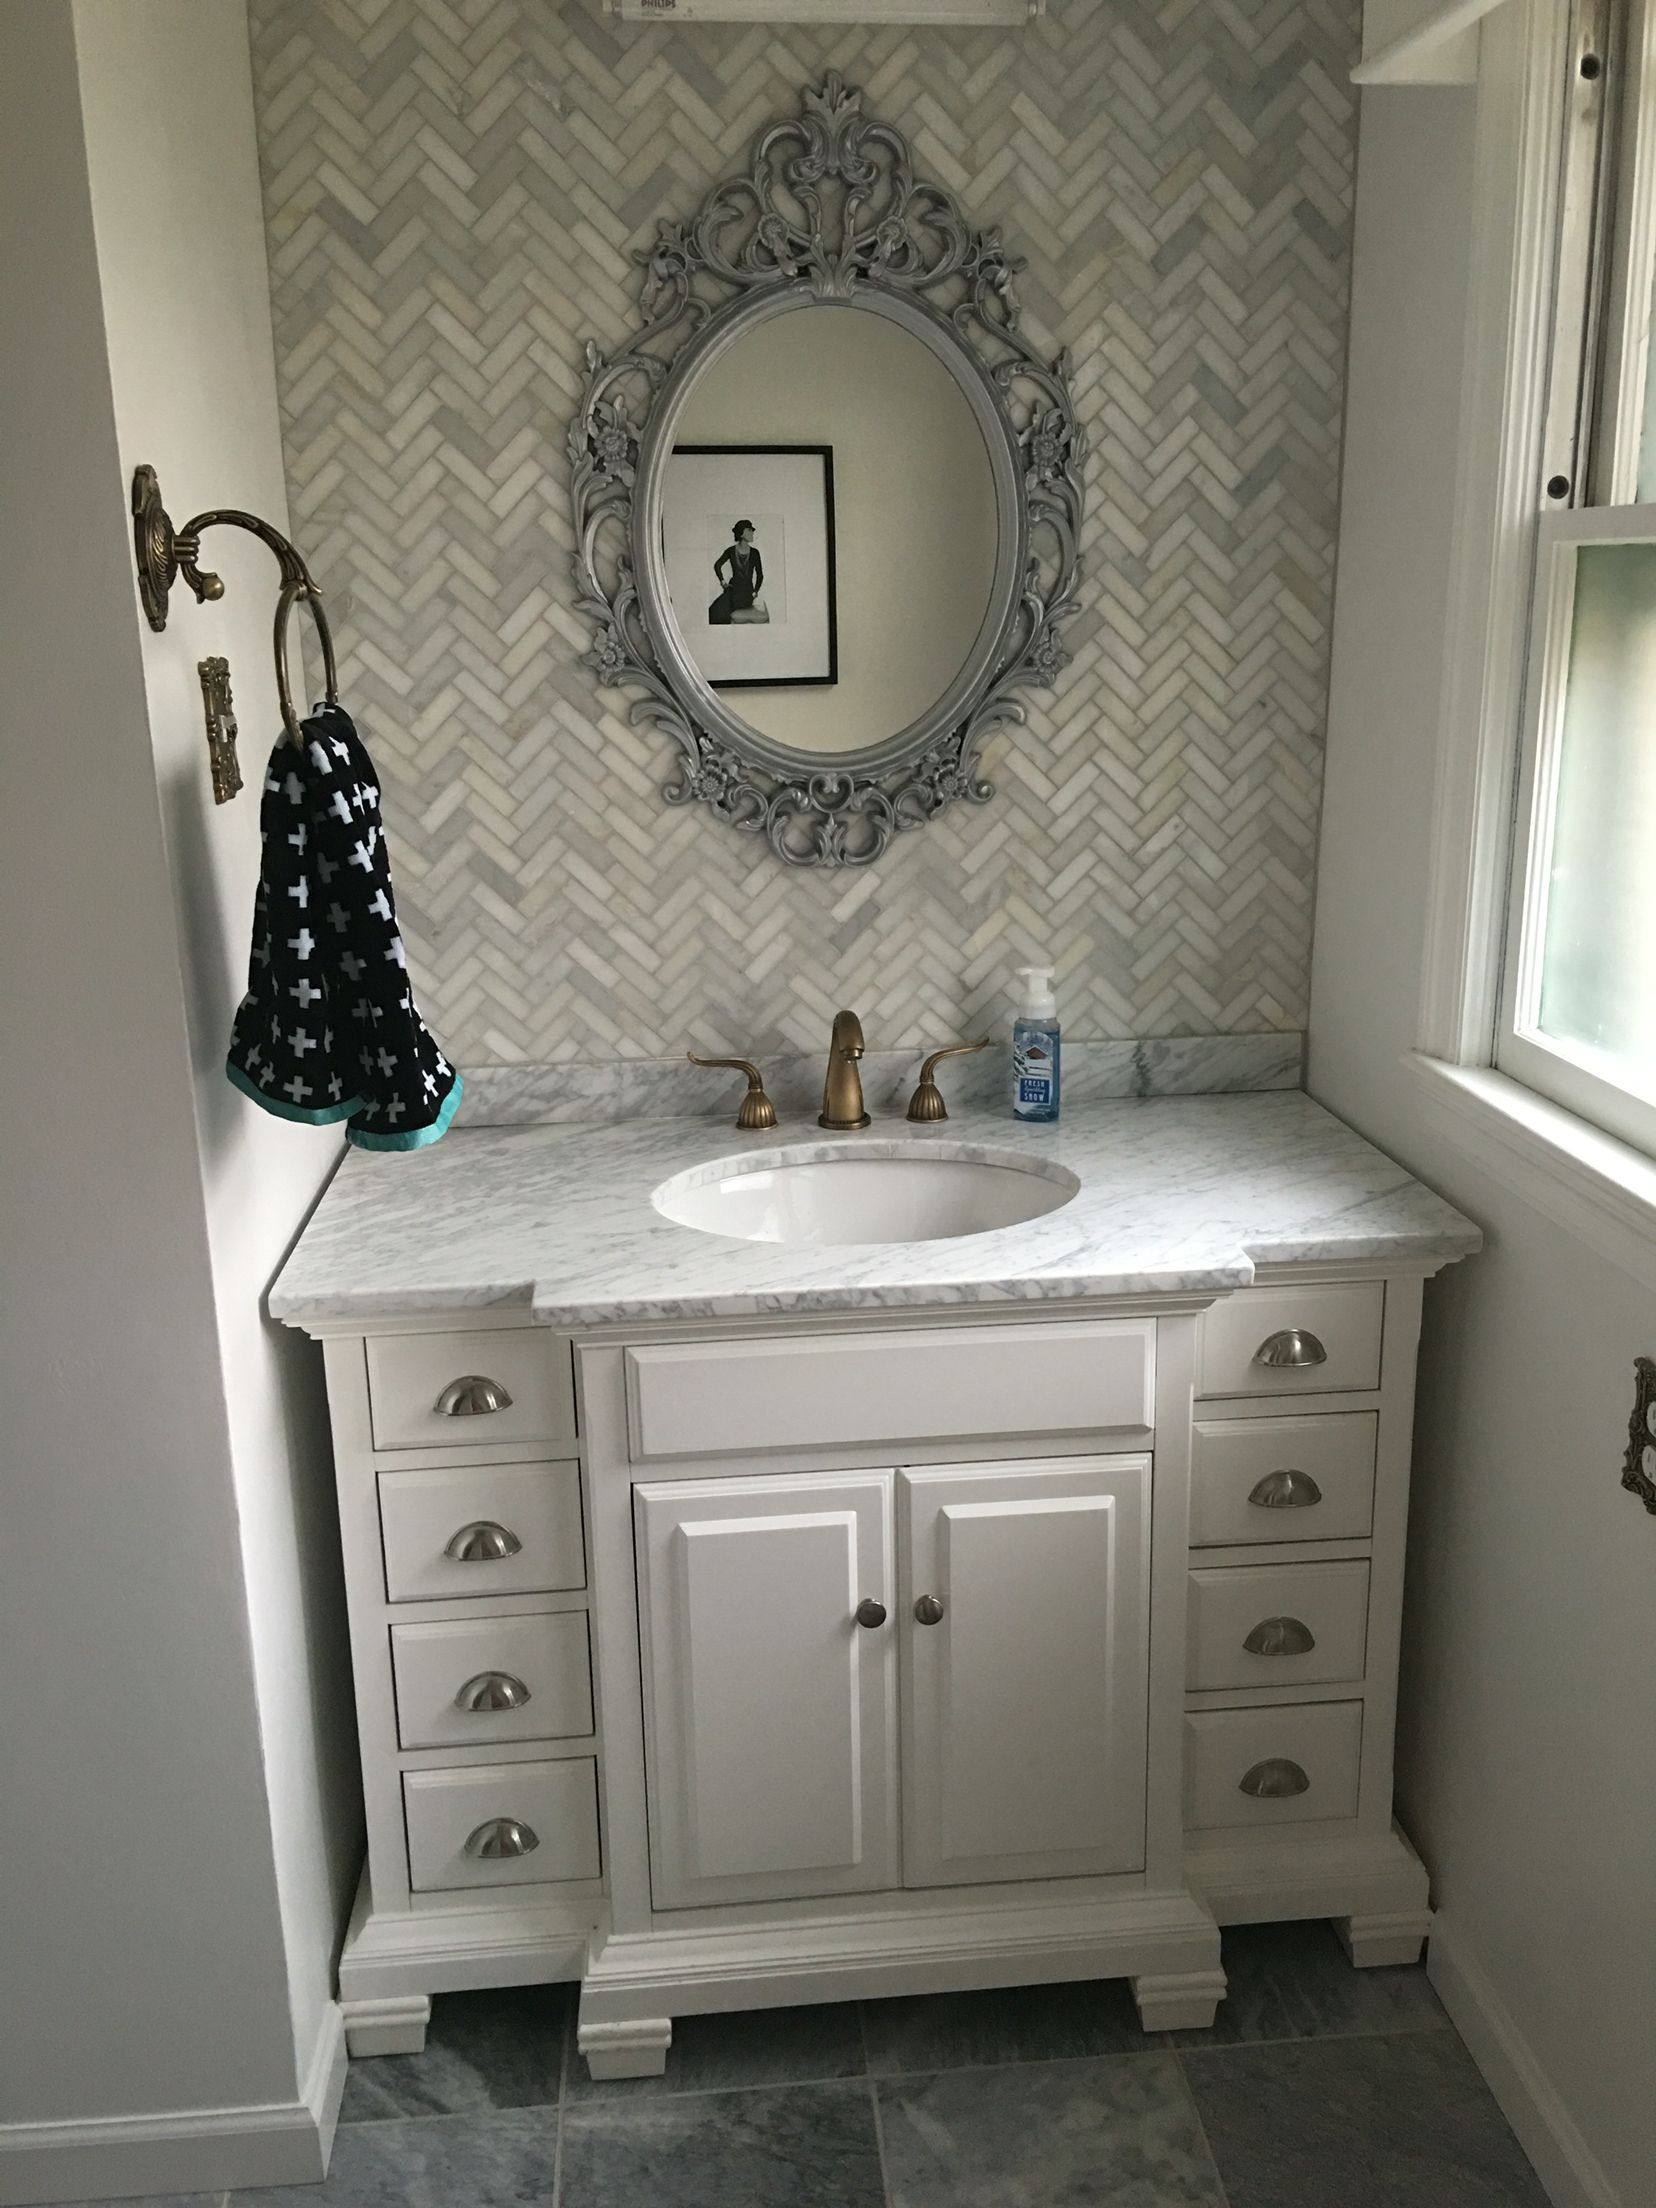 Allen roth vanity chevron mosaic back splash with gray